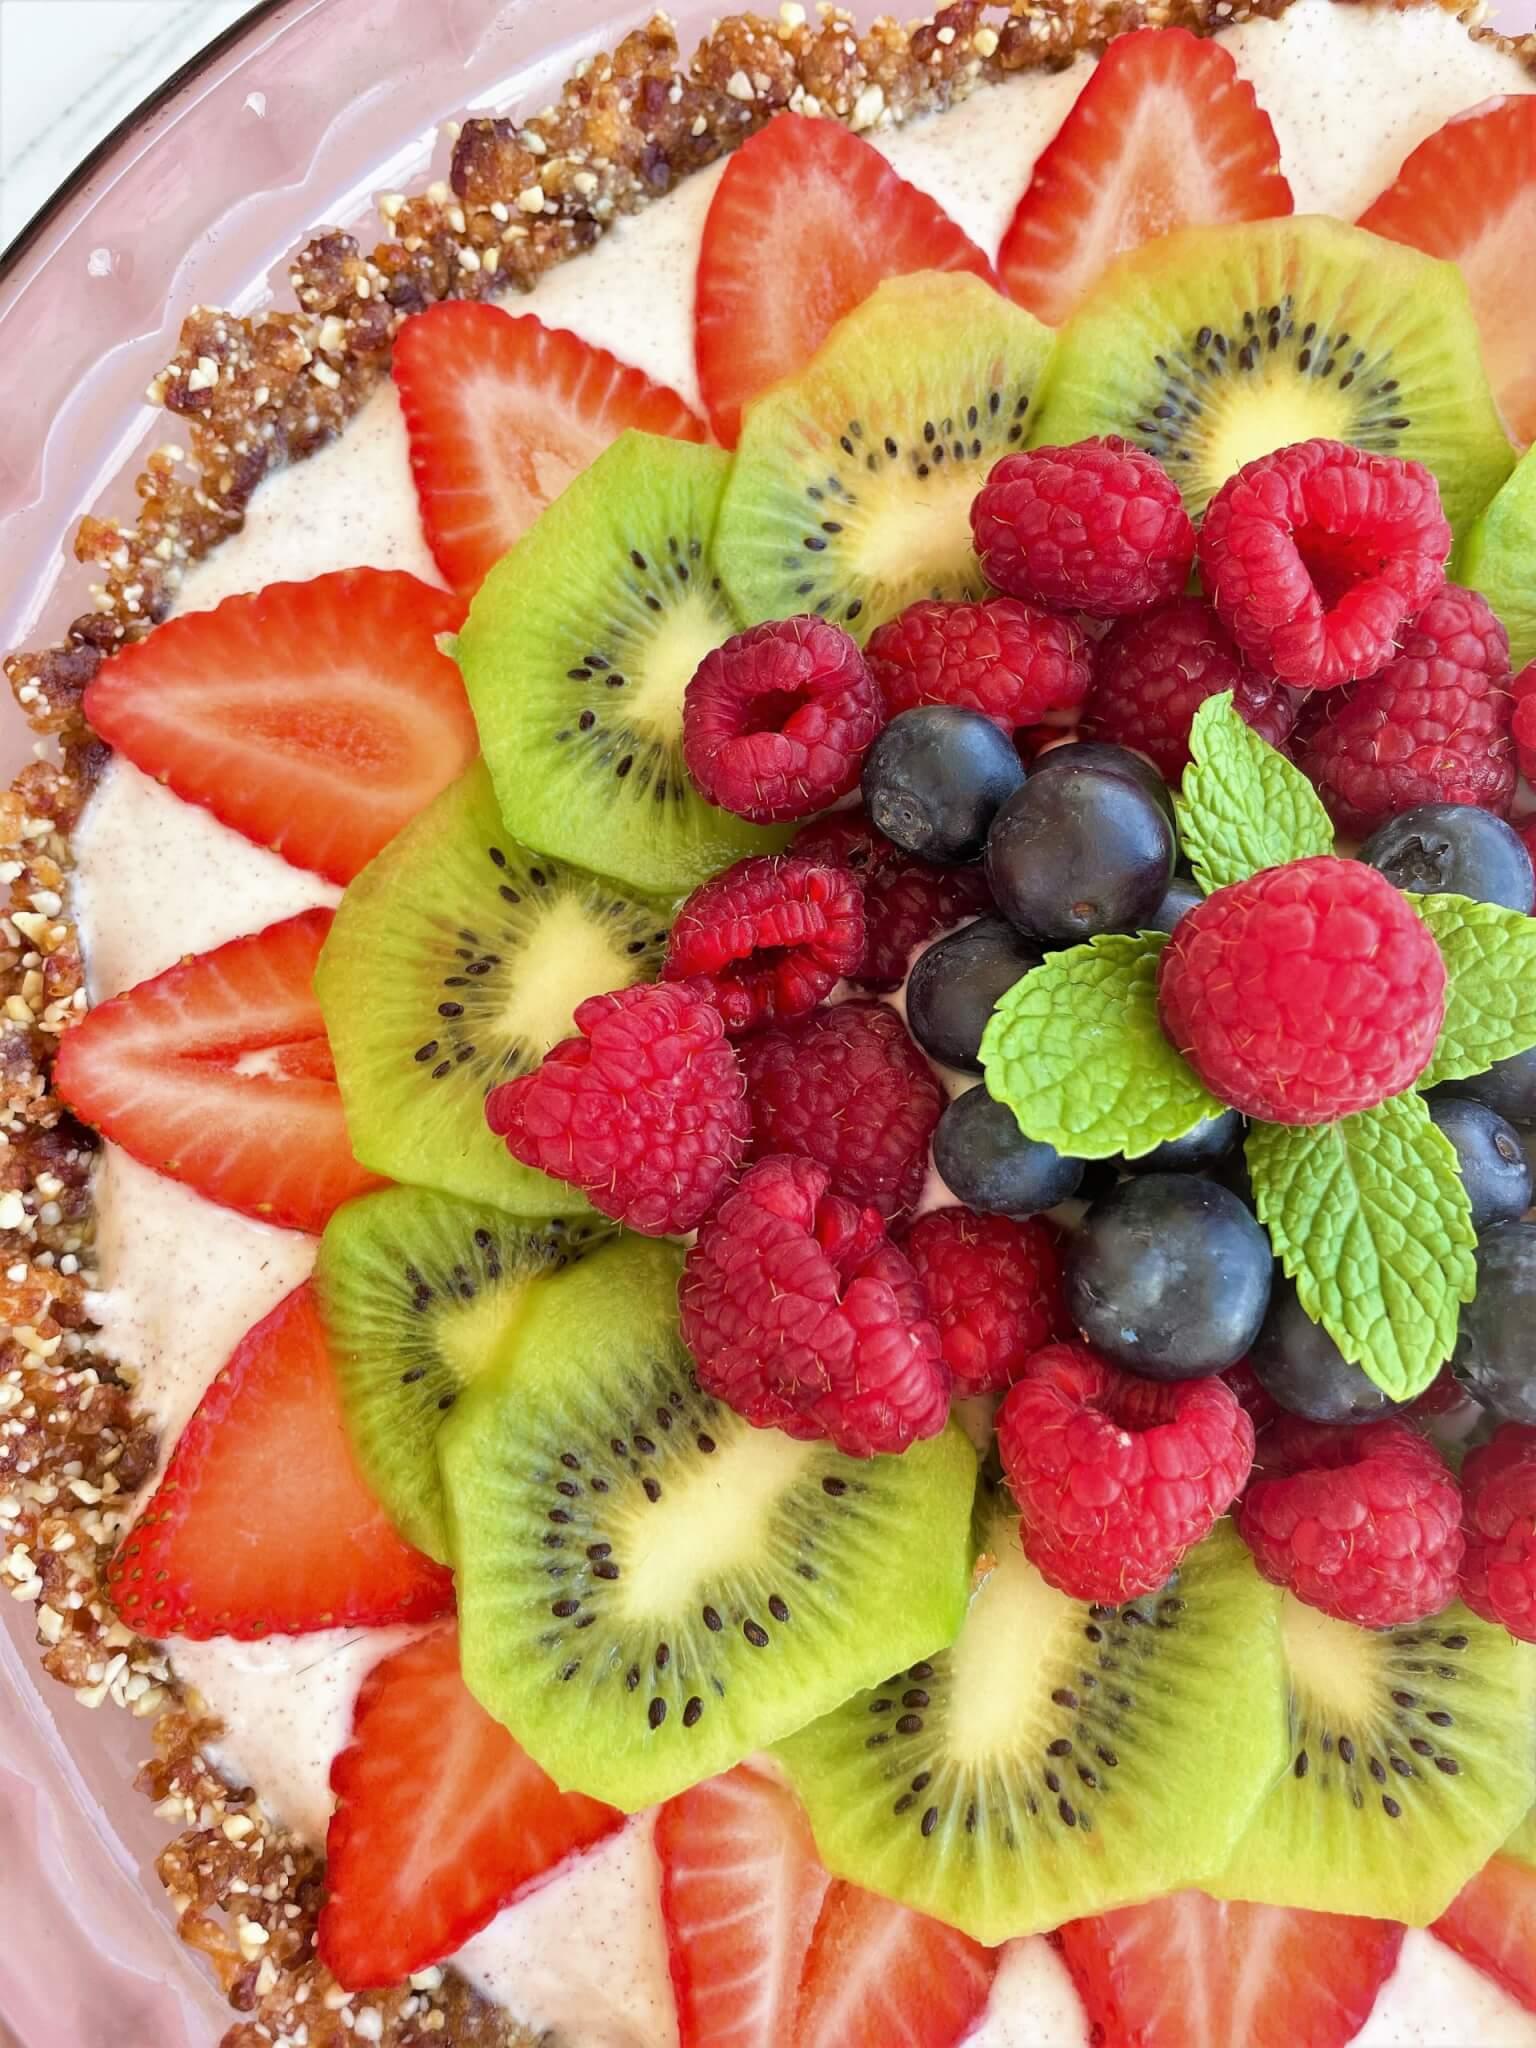 Fruit and Yogurt Tart